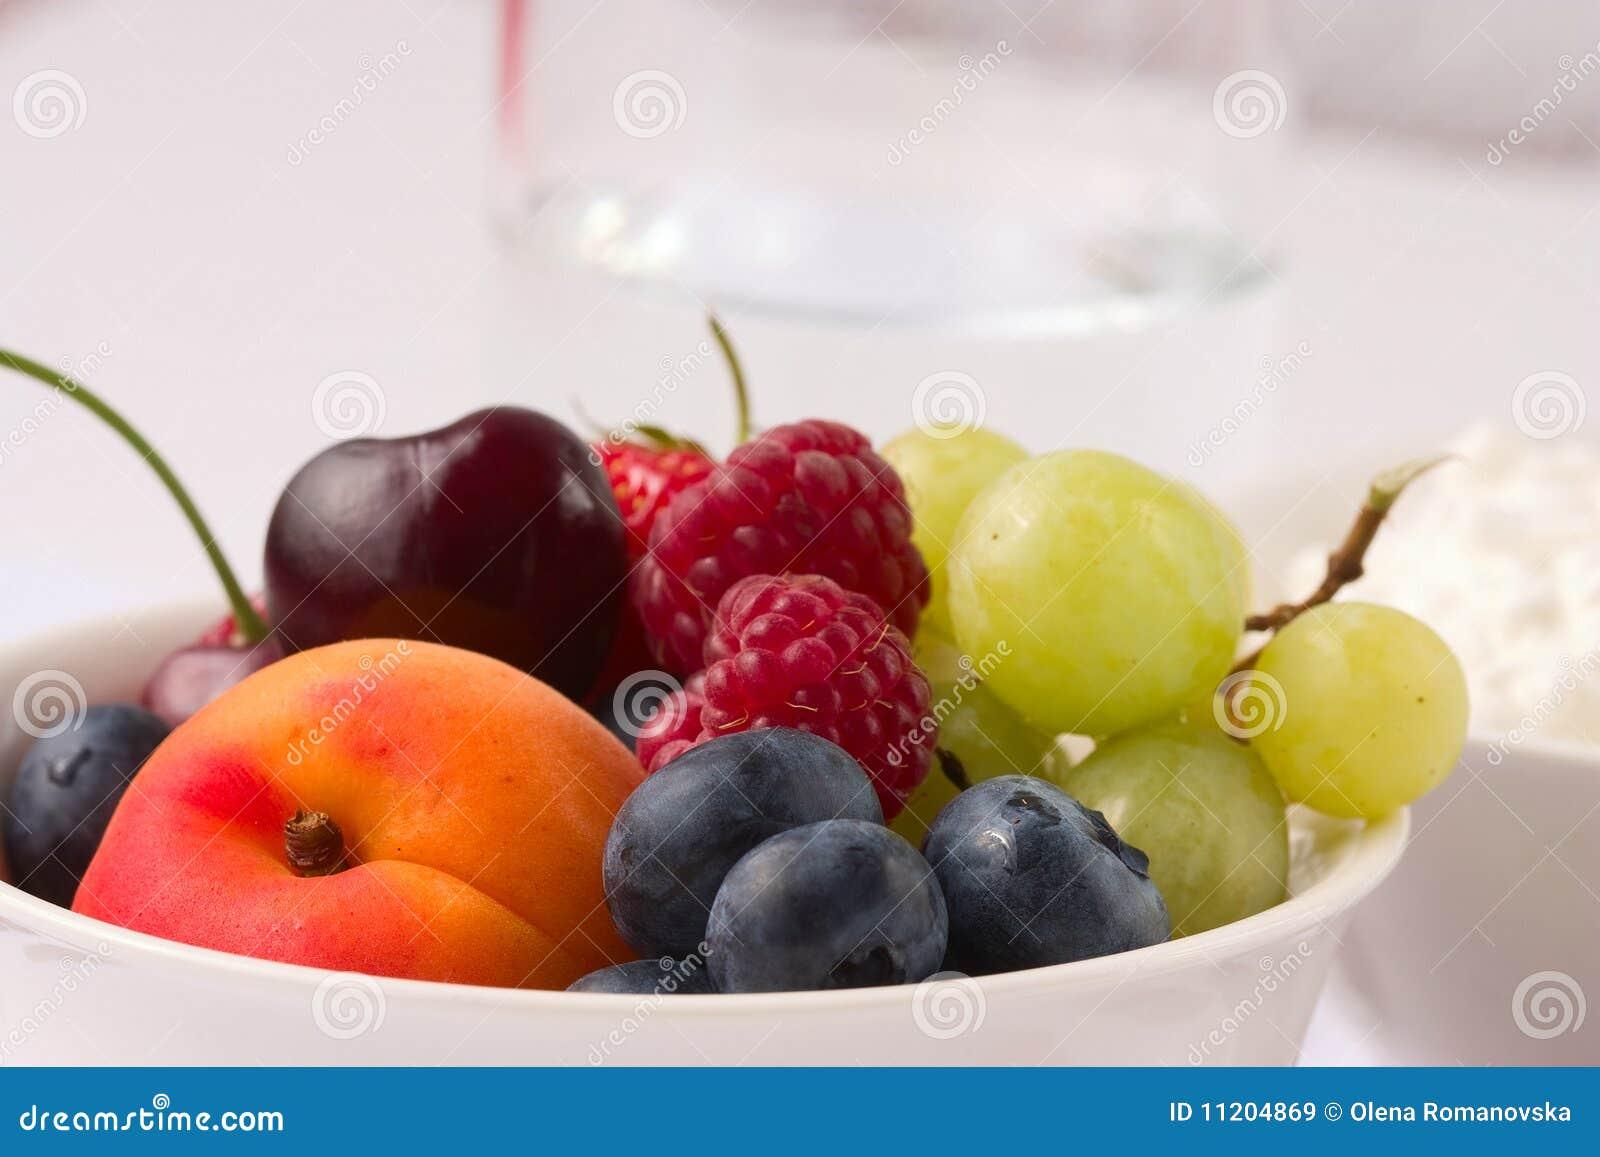 healthy fruit recipes for breakfast fruit art